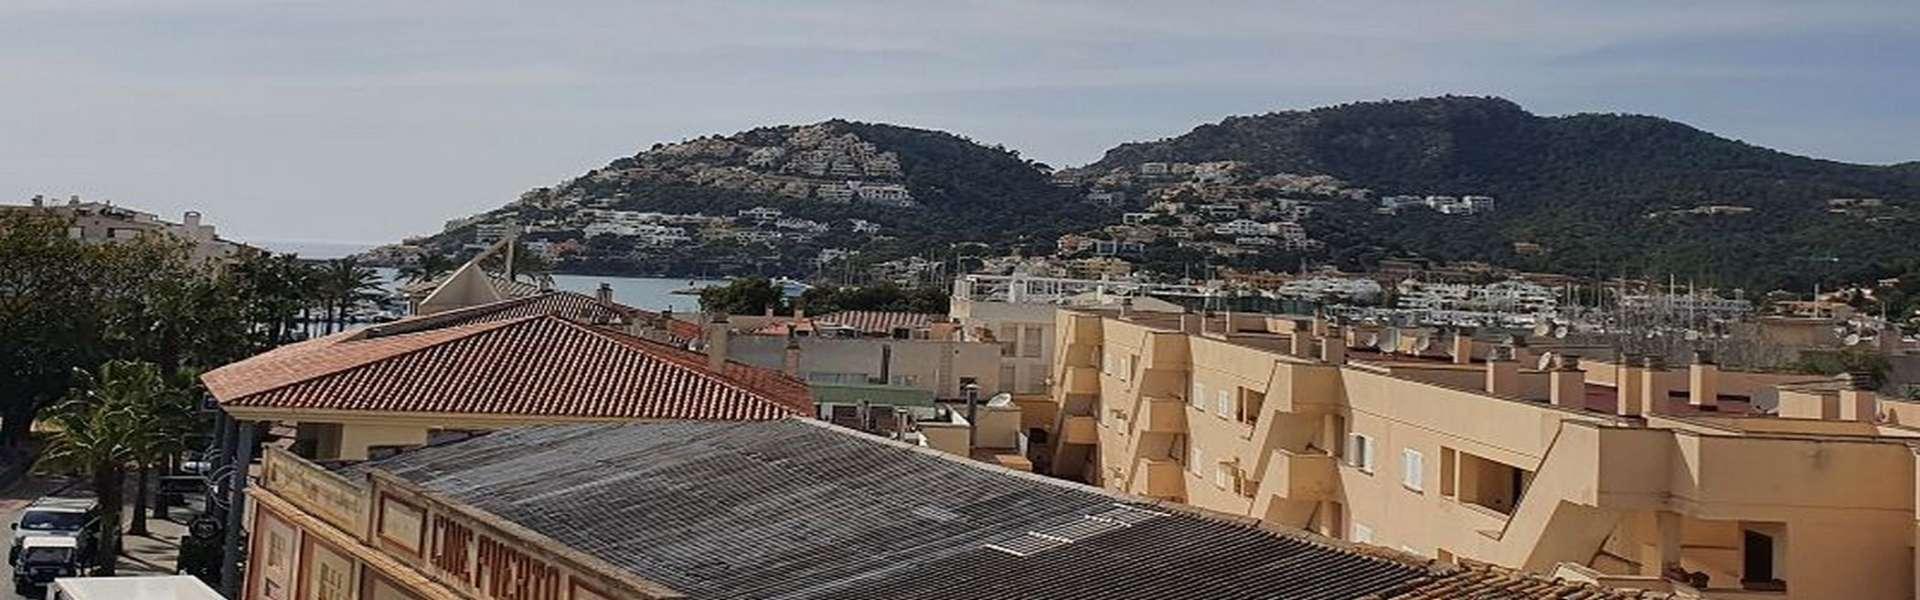 Port d'Andratx - Exclusive penthouse for sale